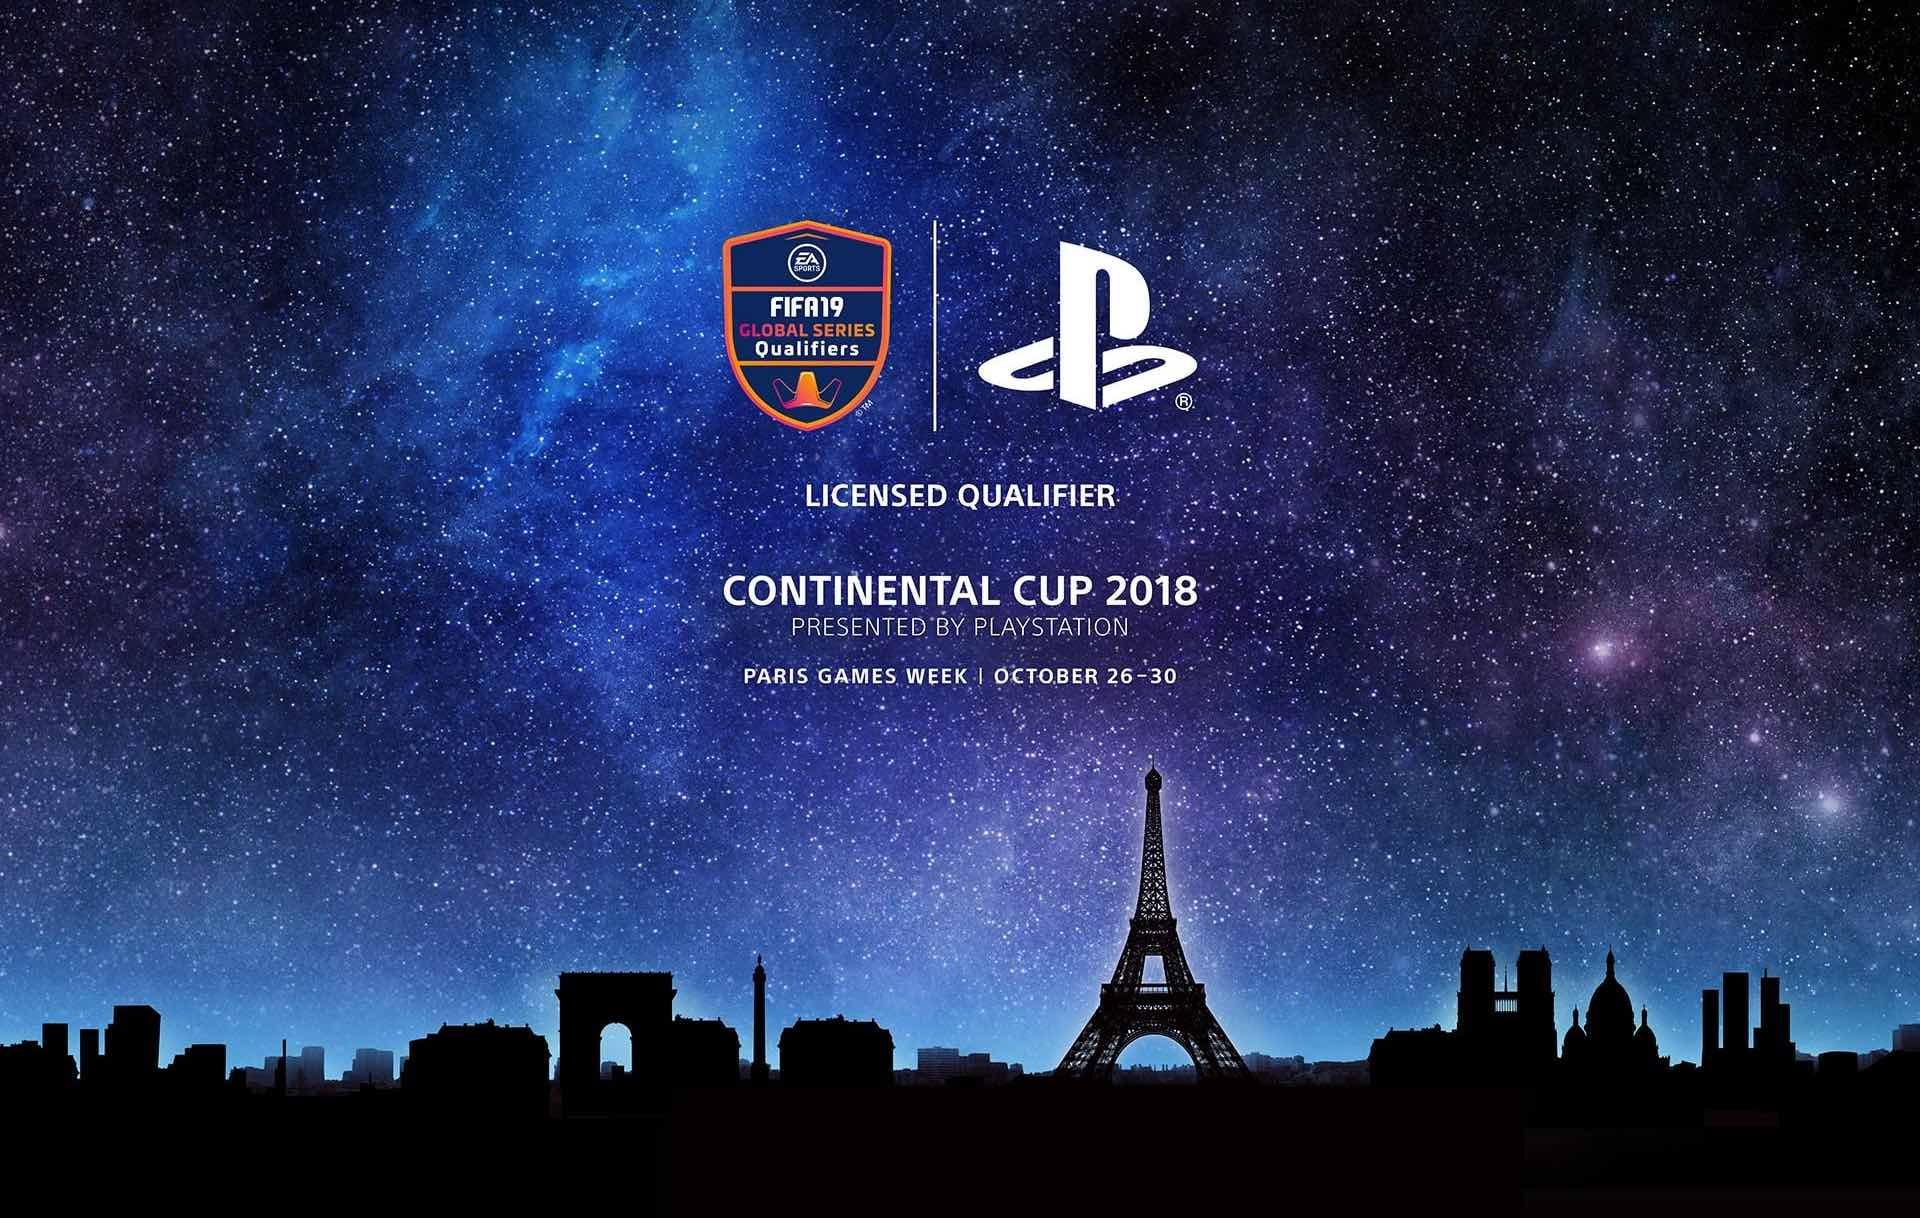 Global Series EA SPORTS FIFA 19